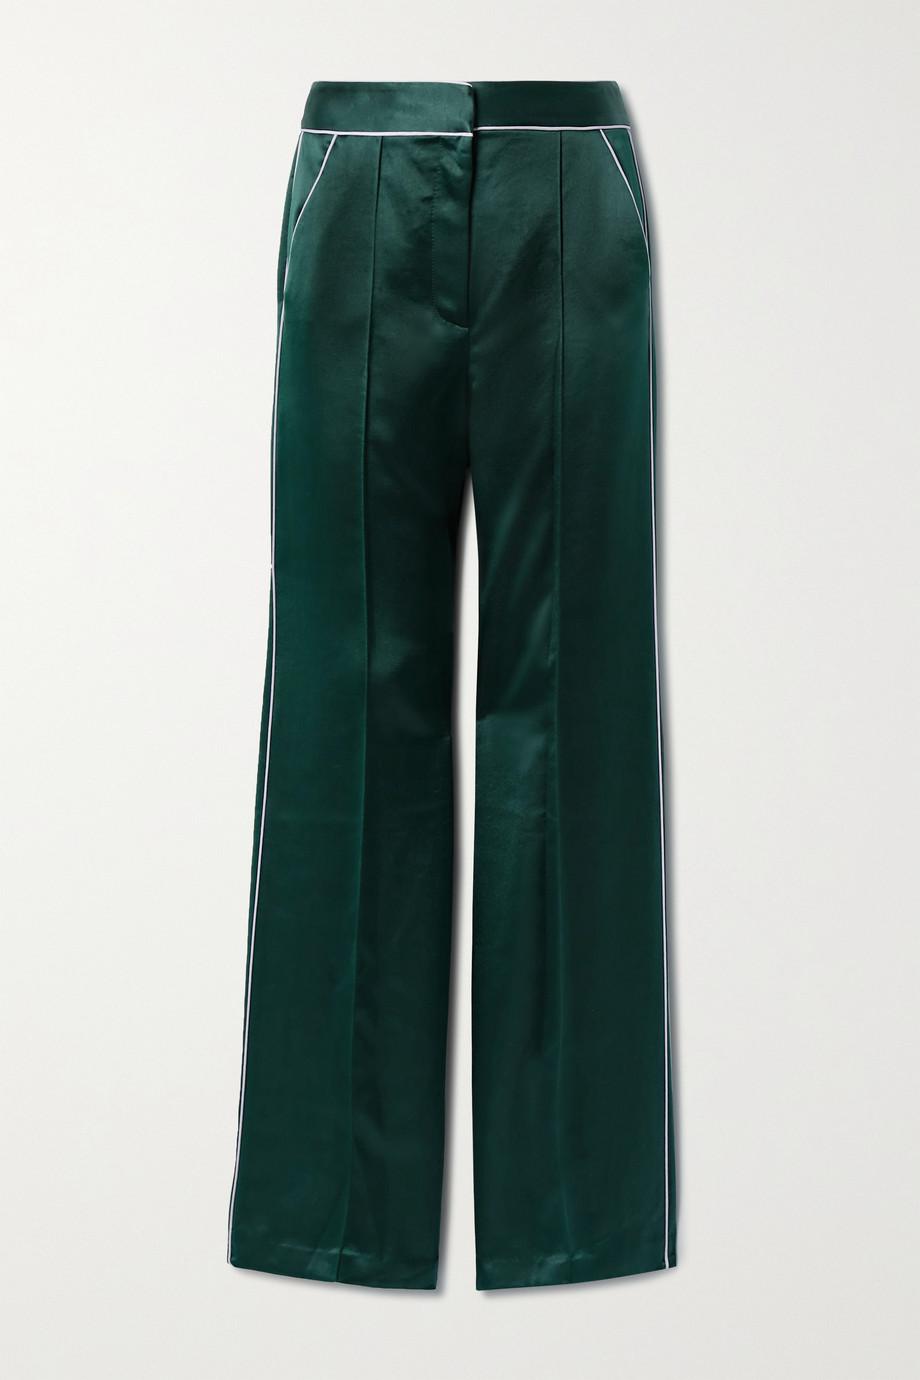 Veronica Beard Edia satin wide-leg pants